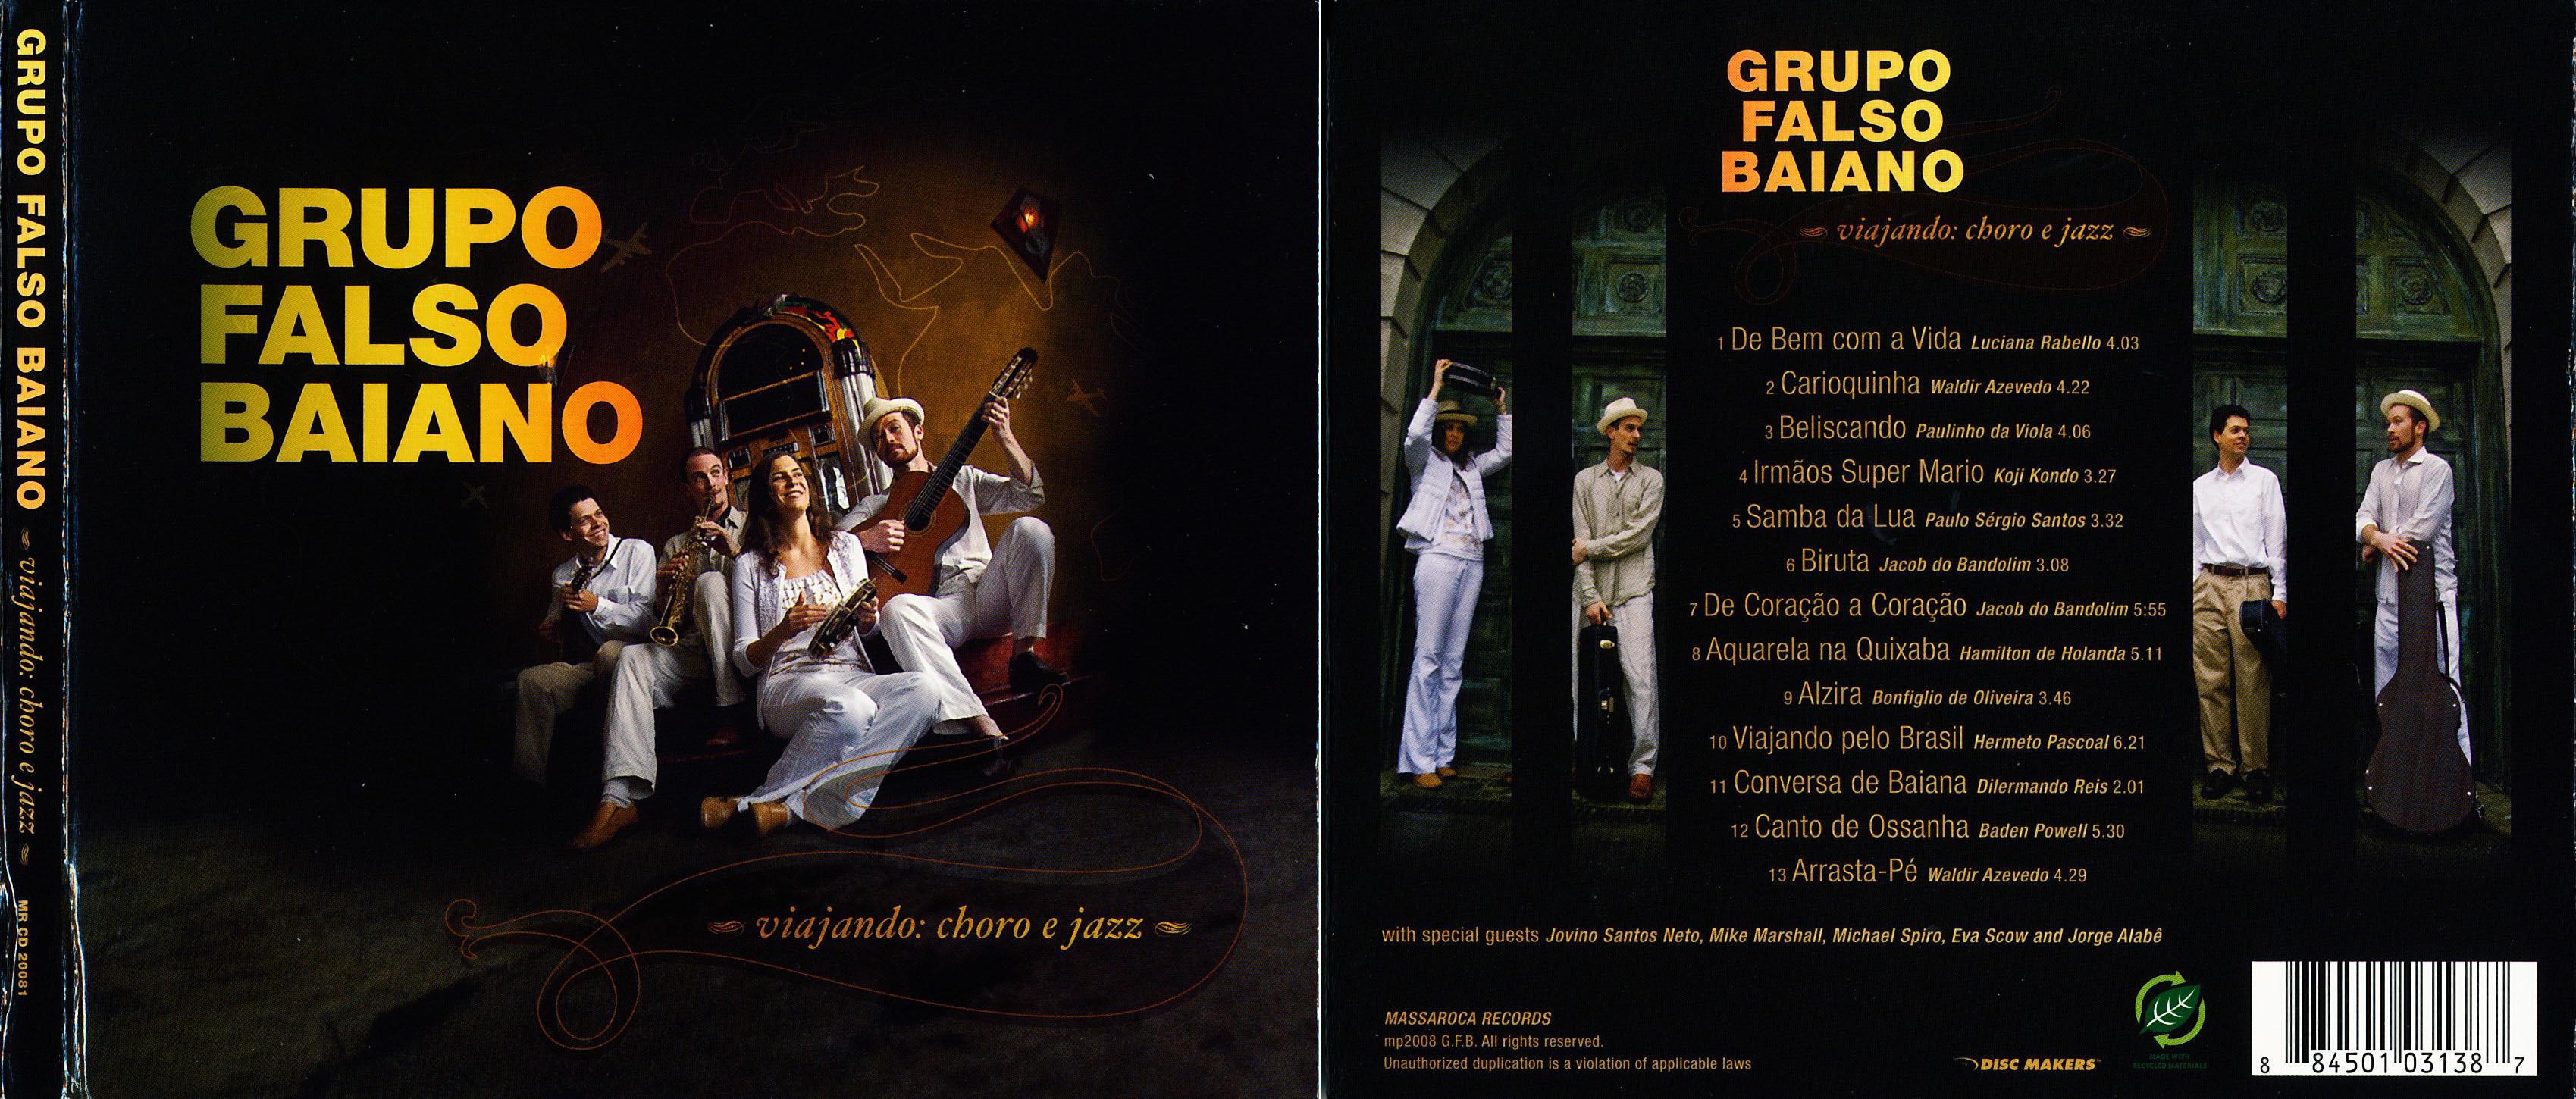 Grupo Falso Baiano | Viajando Choro e Jazz